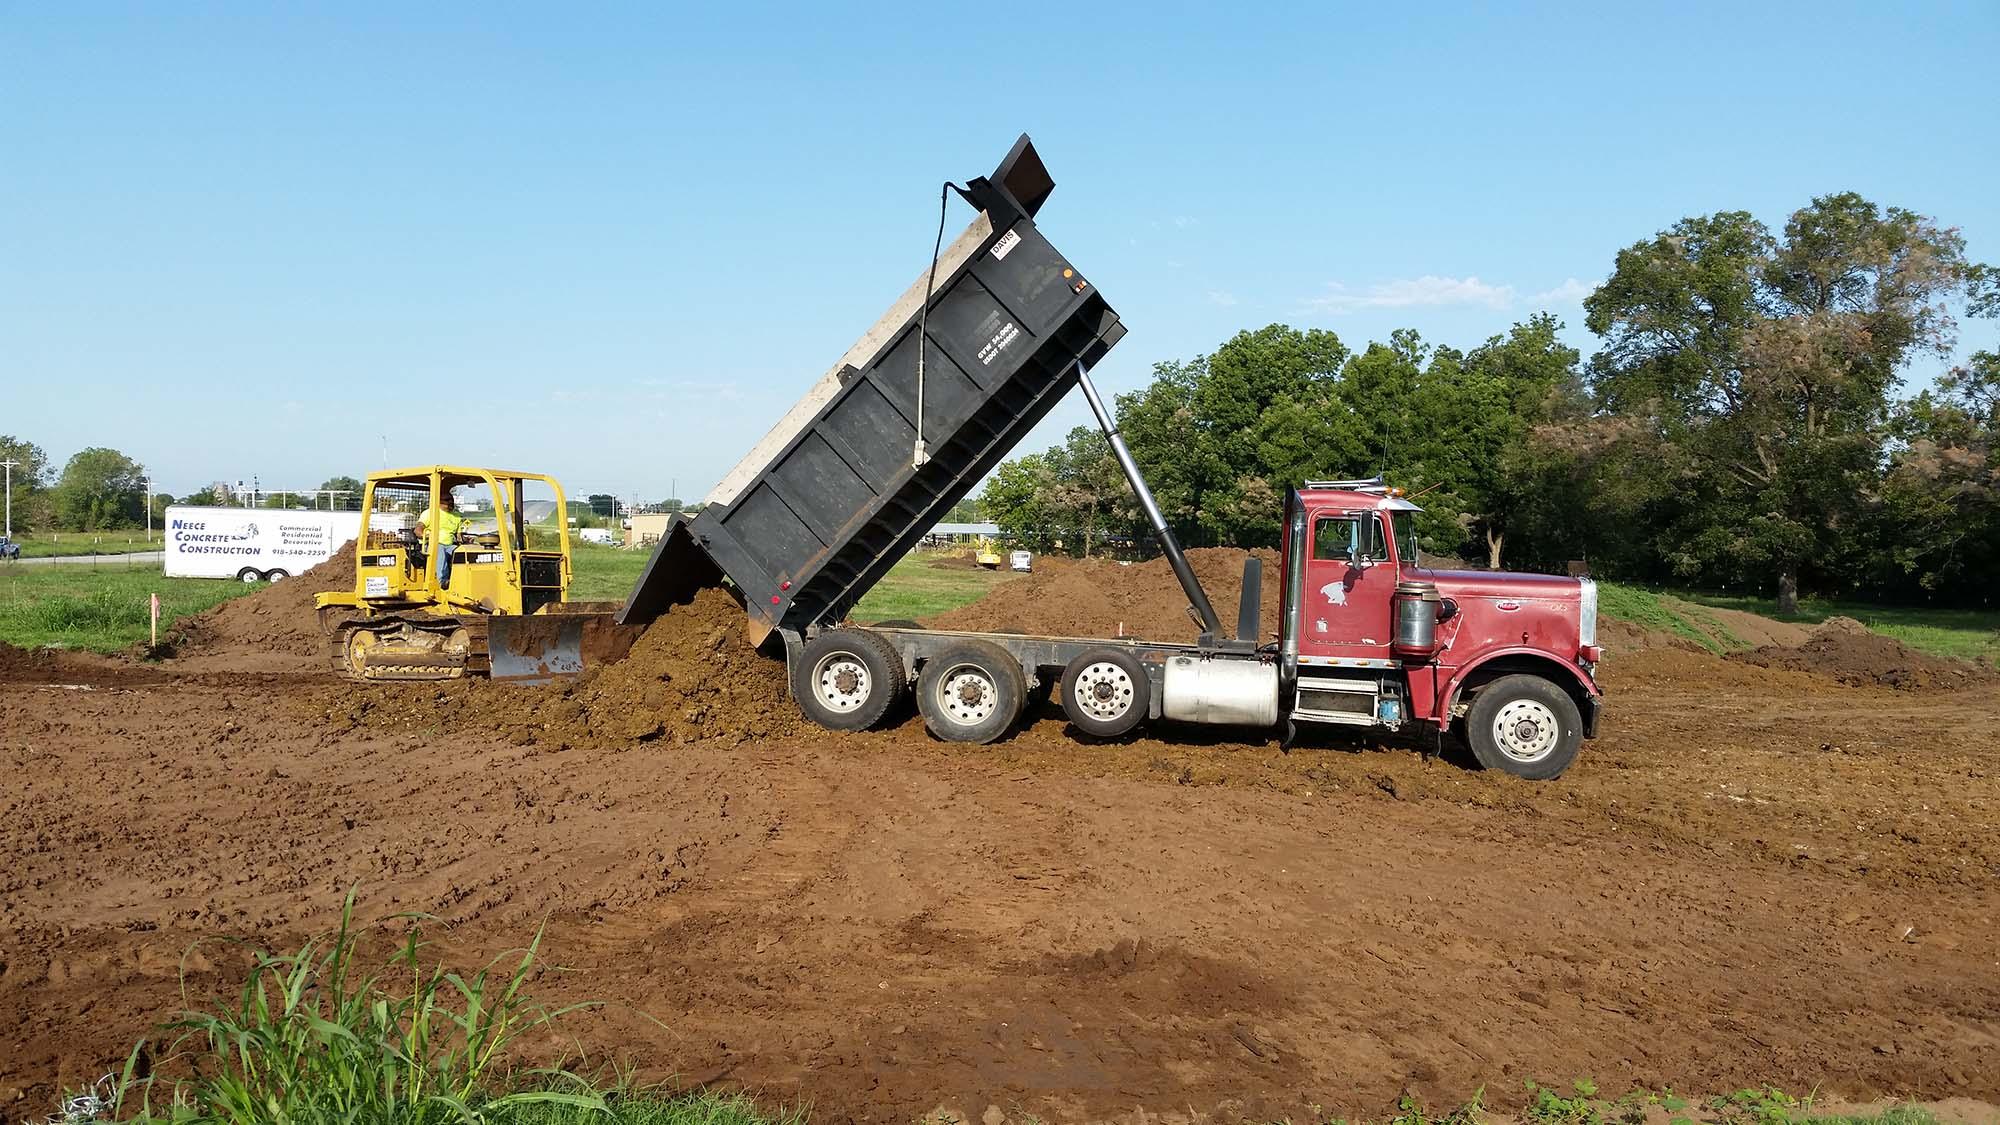 <span class='cat'>Dirt Work</span>